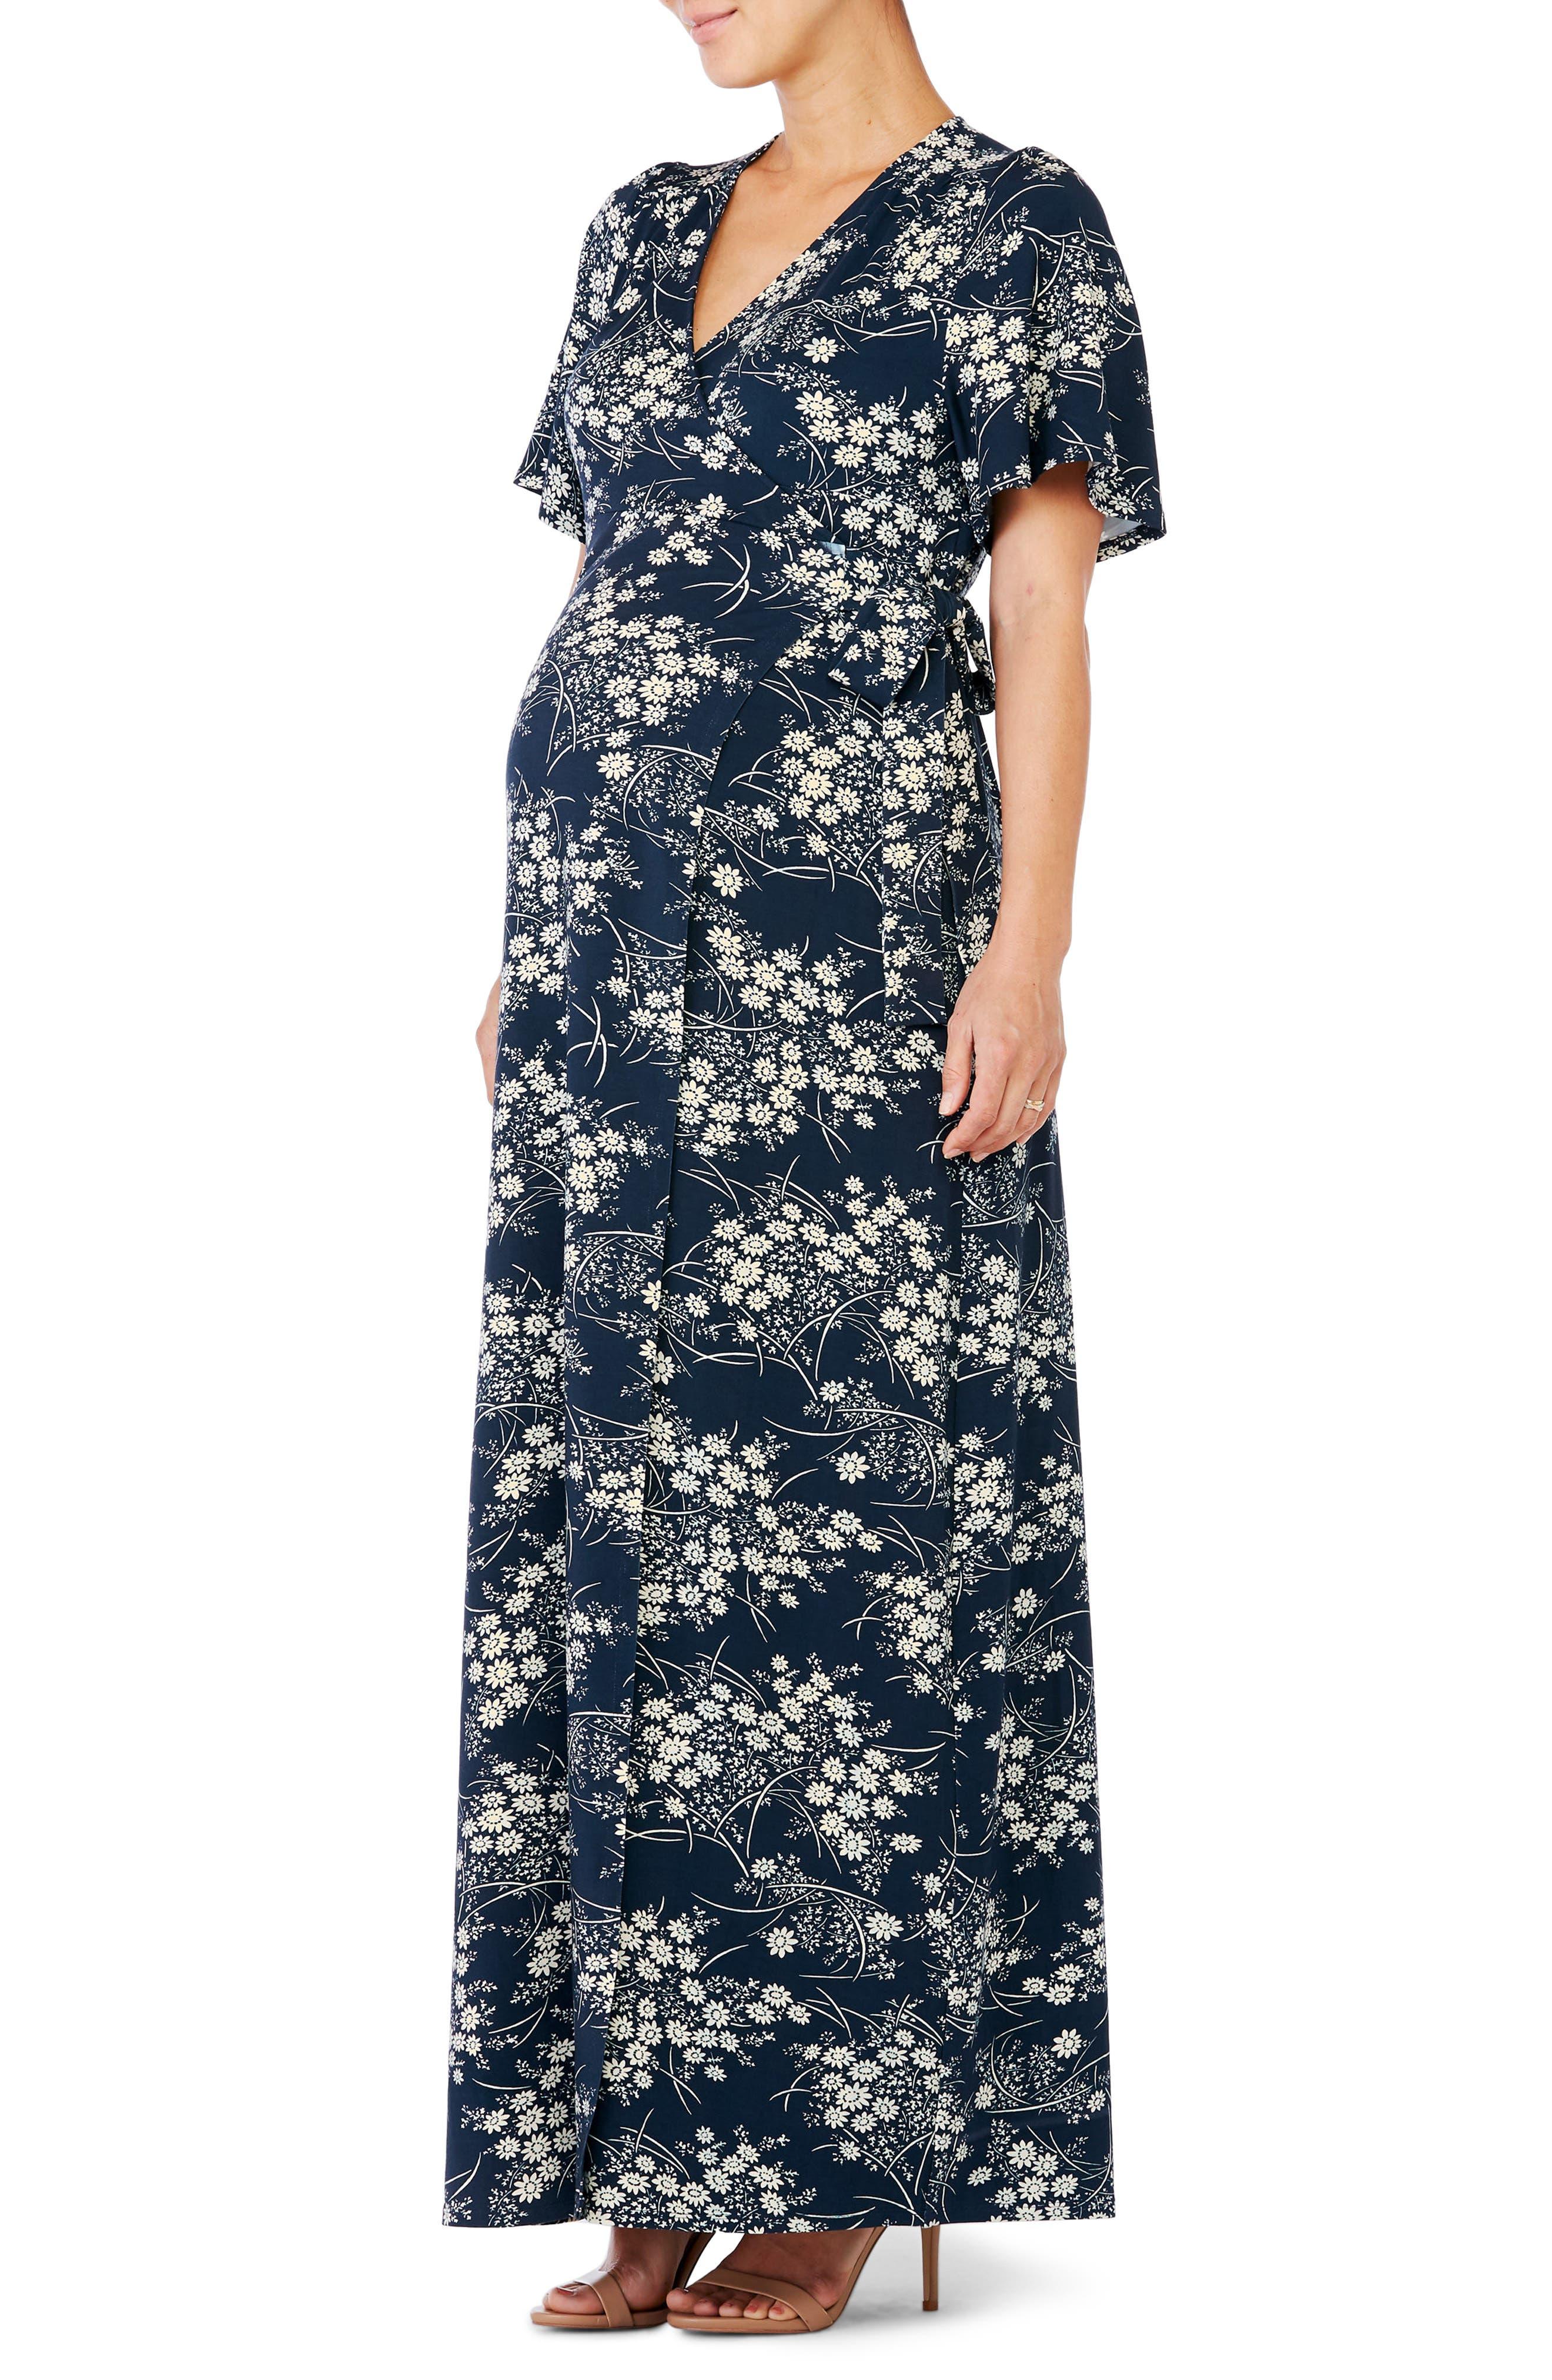 Ingrid & Isabel Flutter Sleeve Knit Maternity/nursing Maxi Dress, White